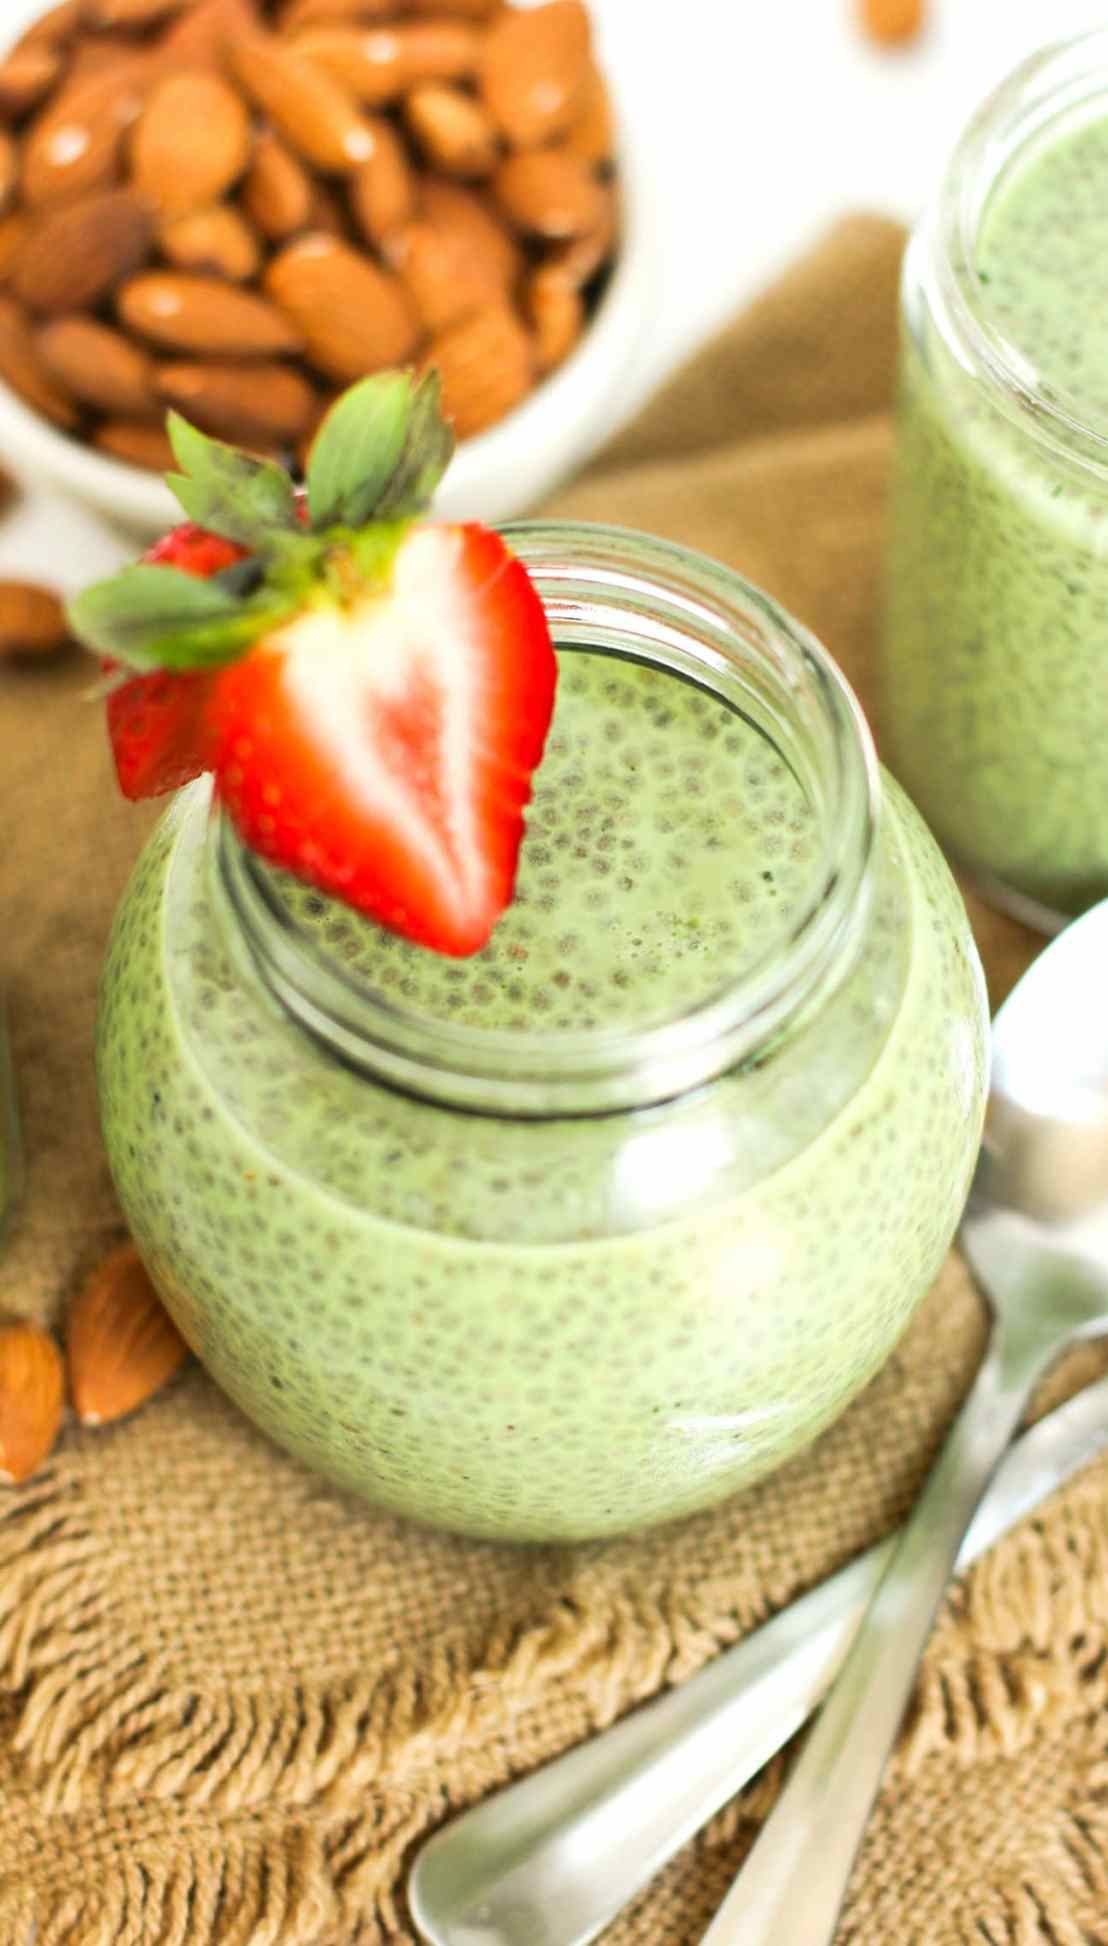 Healthy-Matcha-Green-Tea-Chia-Seed-Pudding3-e1527489730510.jpg